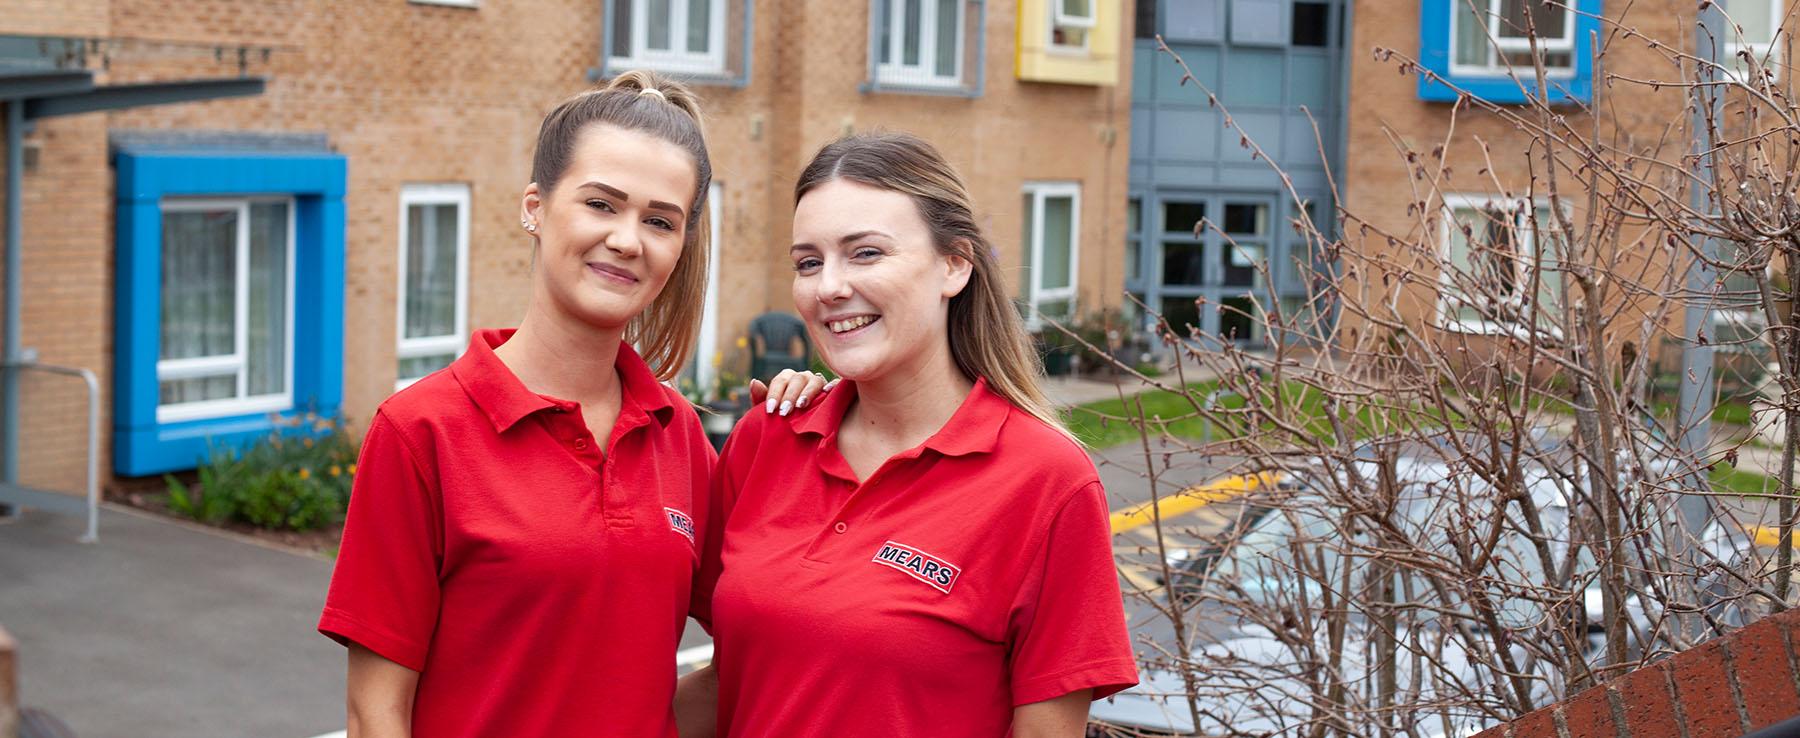 Proud to Care - 2 Girls 1 2019 - CB Bristol Design 2019